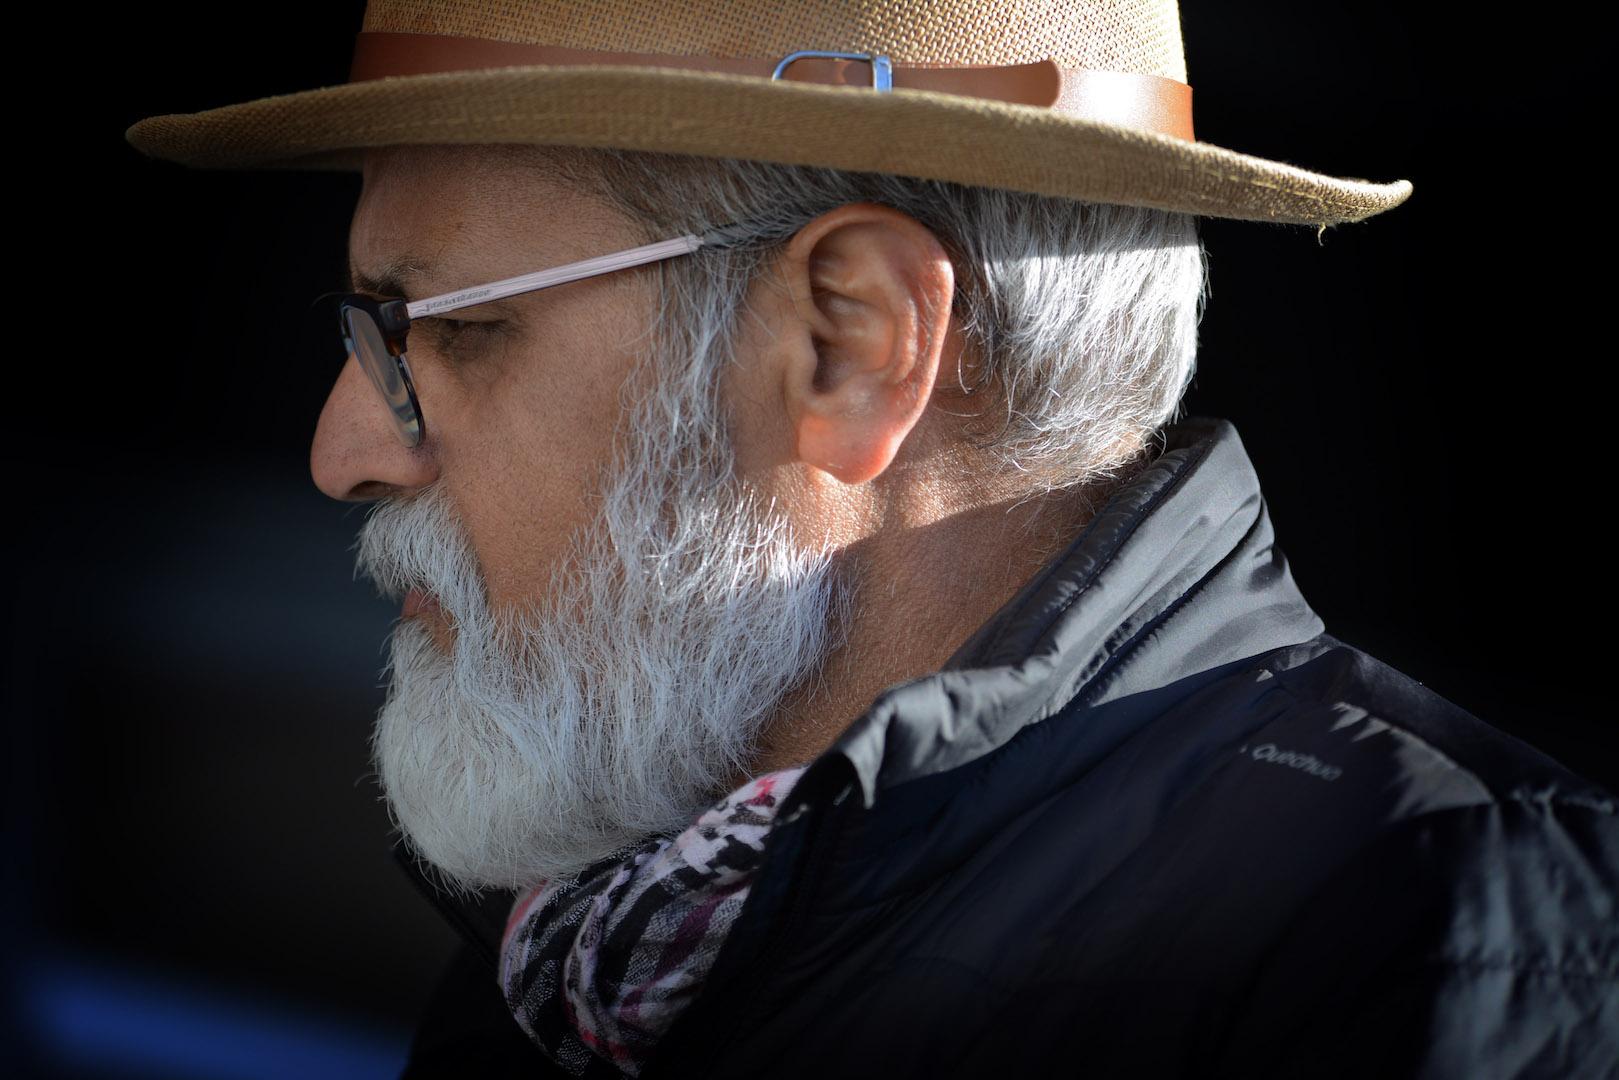 Ashok Kochhar - a master street photographer